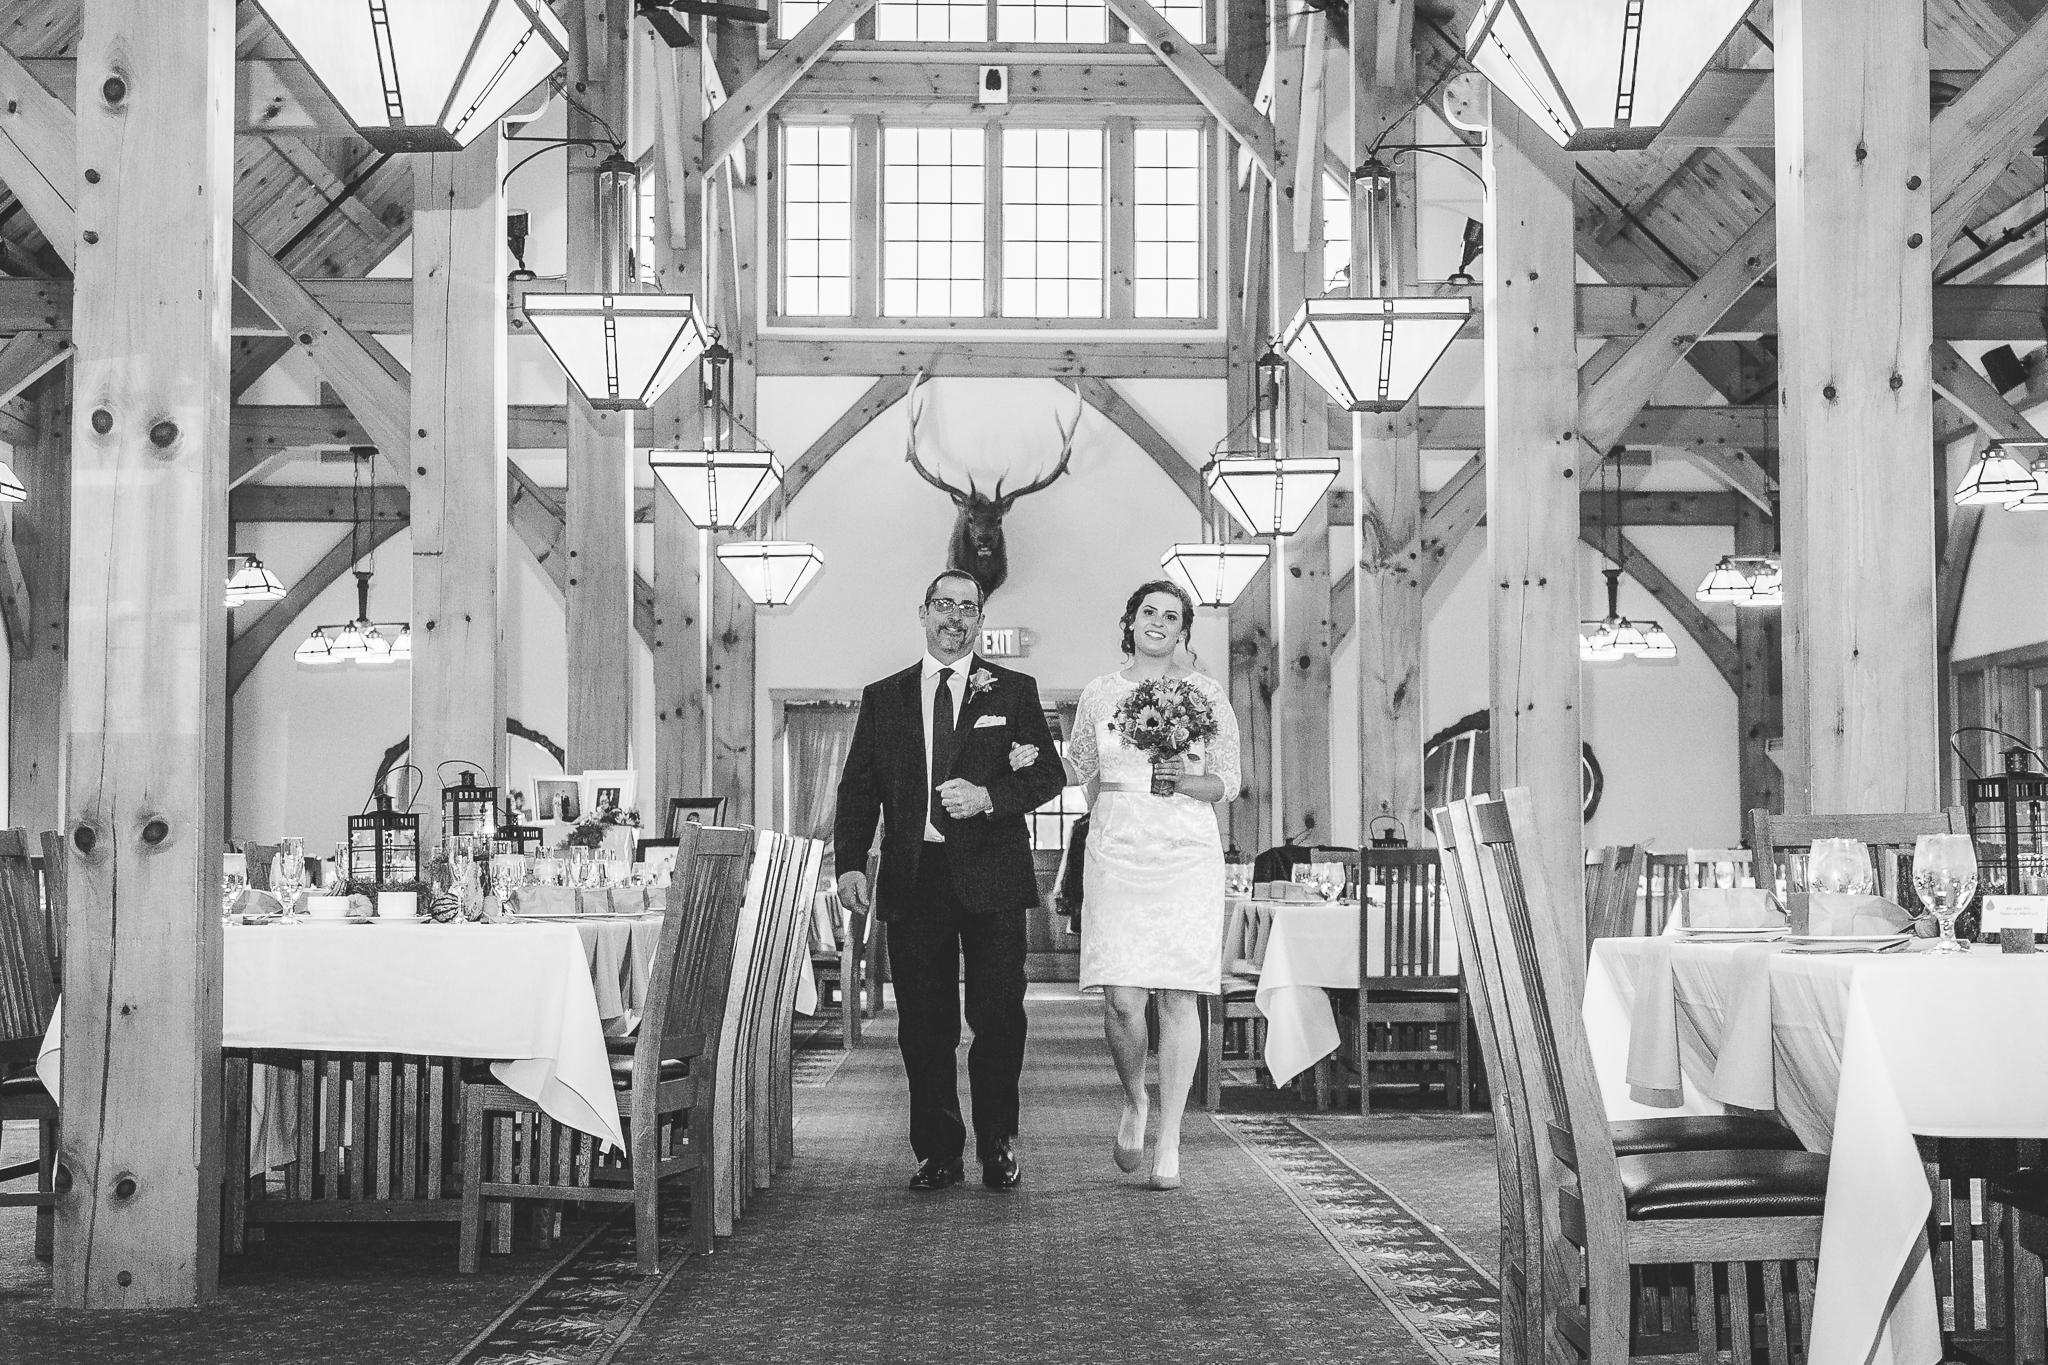 camuglia-whomstudio-chelsea_and_andy-nycphotographer-wedding-brooklyn-buffalo-timberlodge-068-5476.jpg